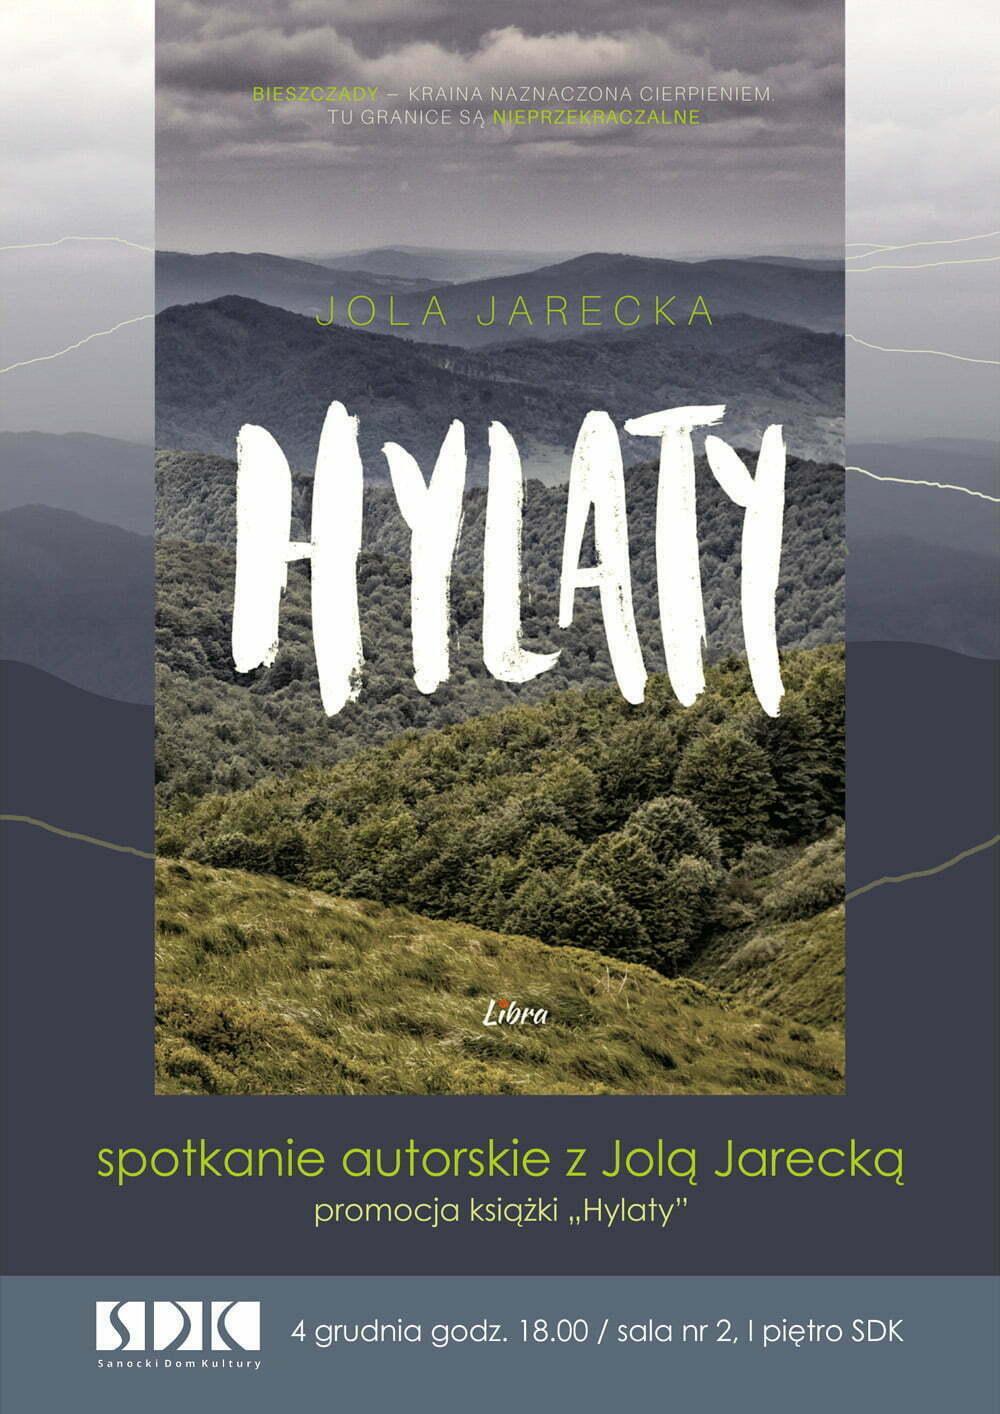 hylaty sdk